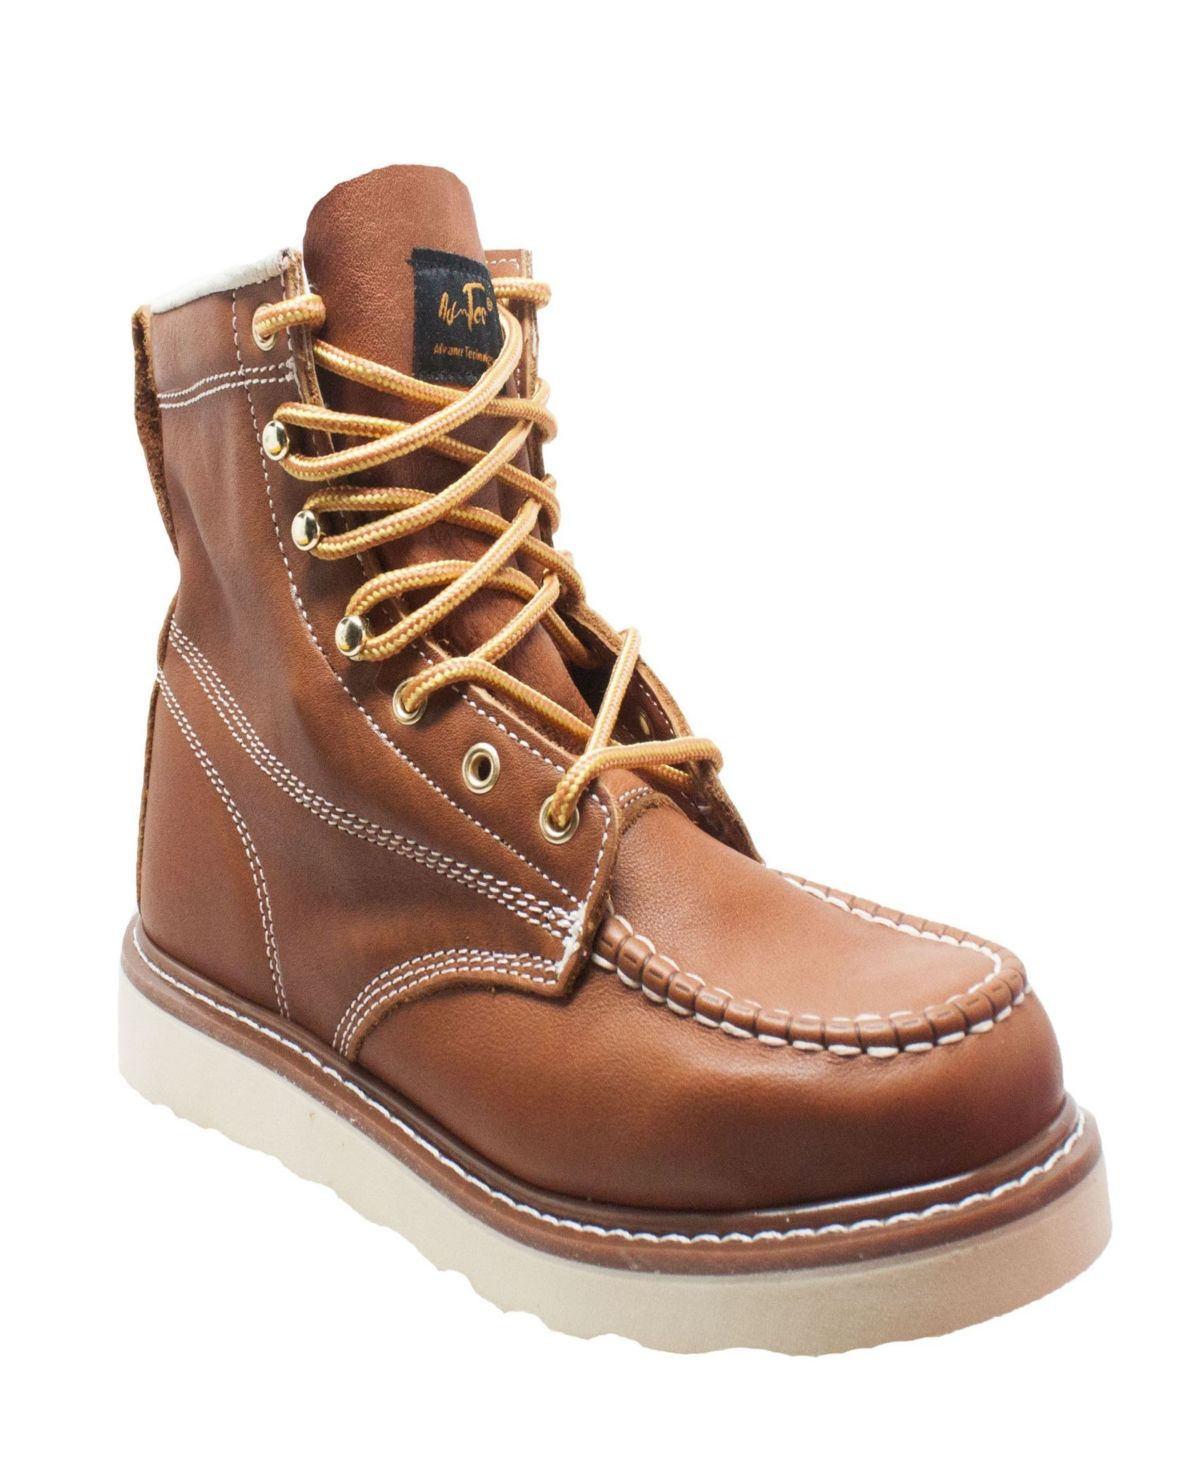 AdTec Mens 8 Inch Farm Boot-M